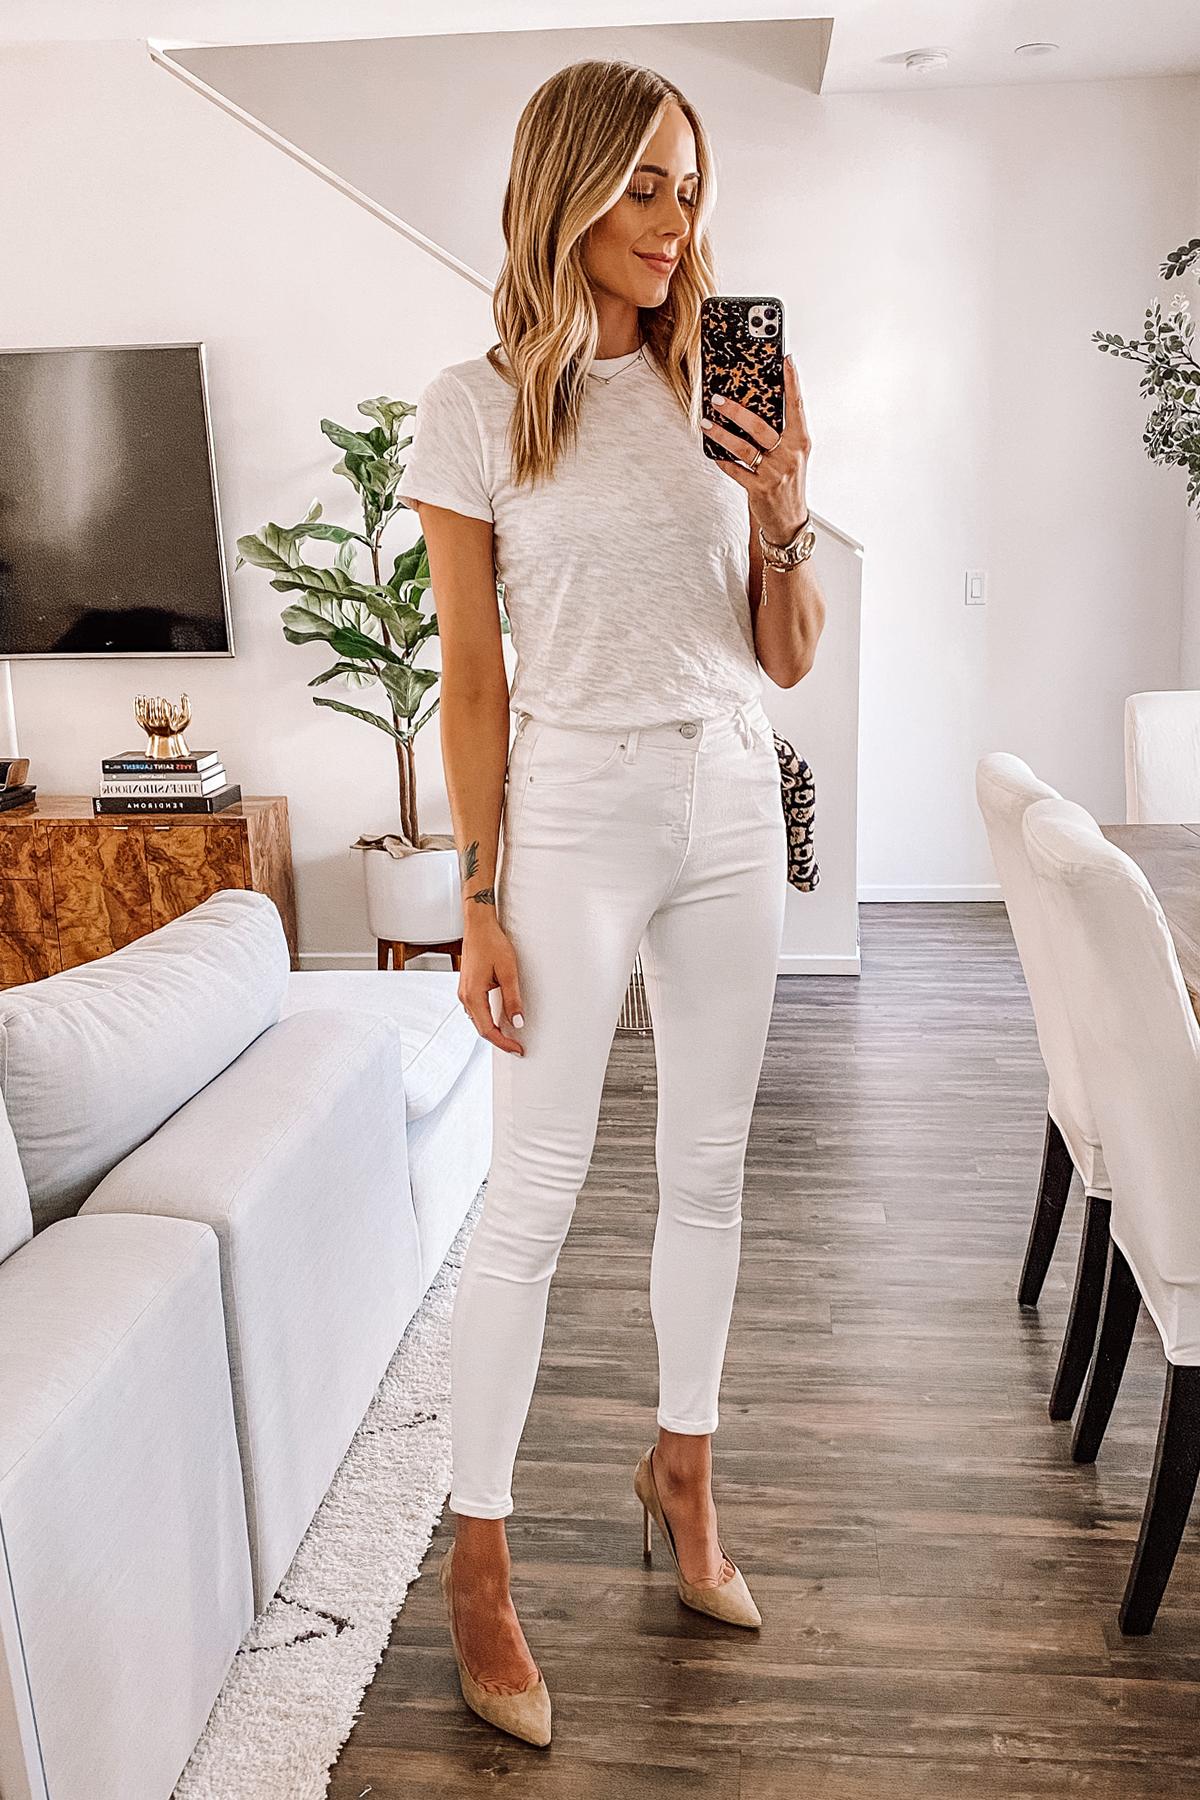 Fashion Jackson Wearing White Tshirt Topshop Jamie White Skinny Jeans Nude Pumps